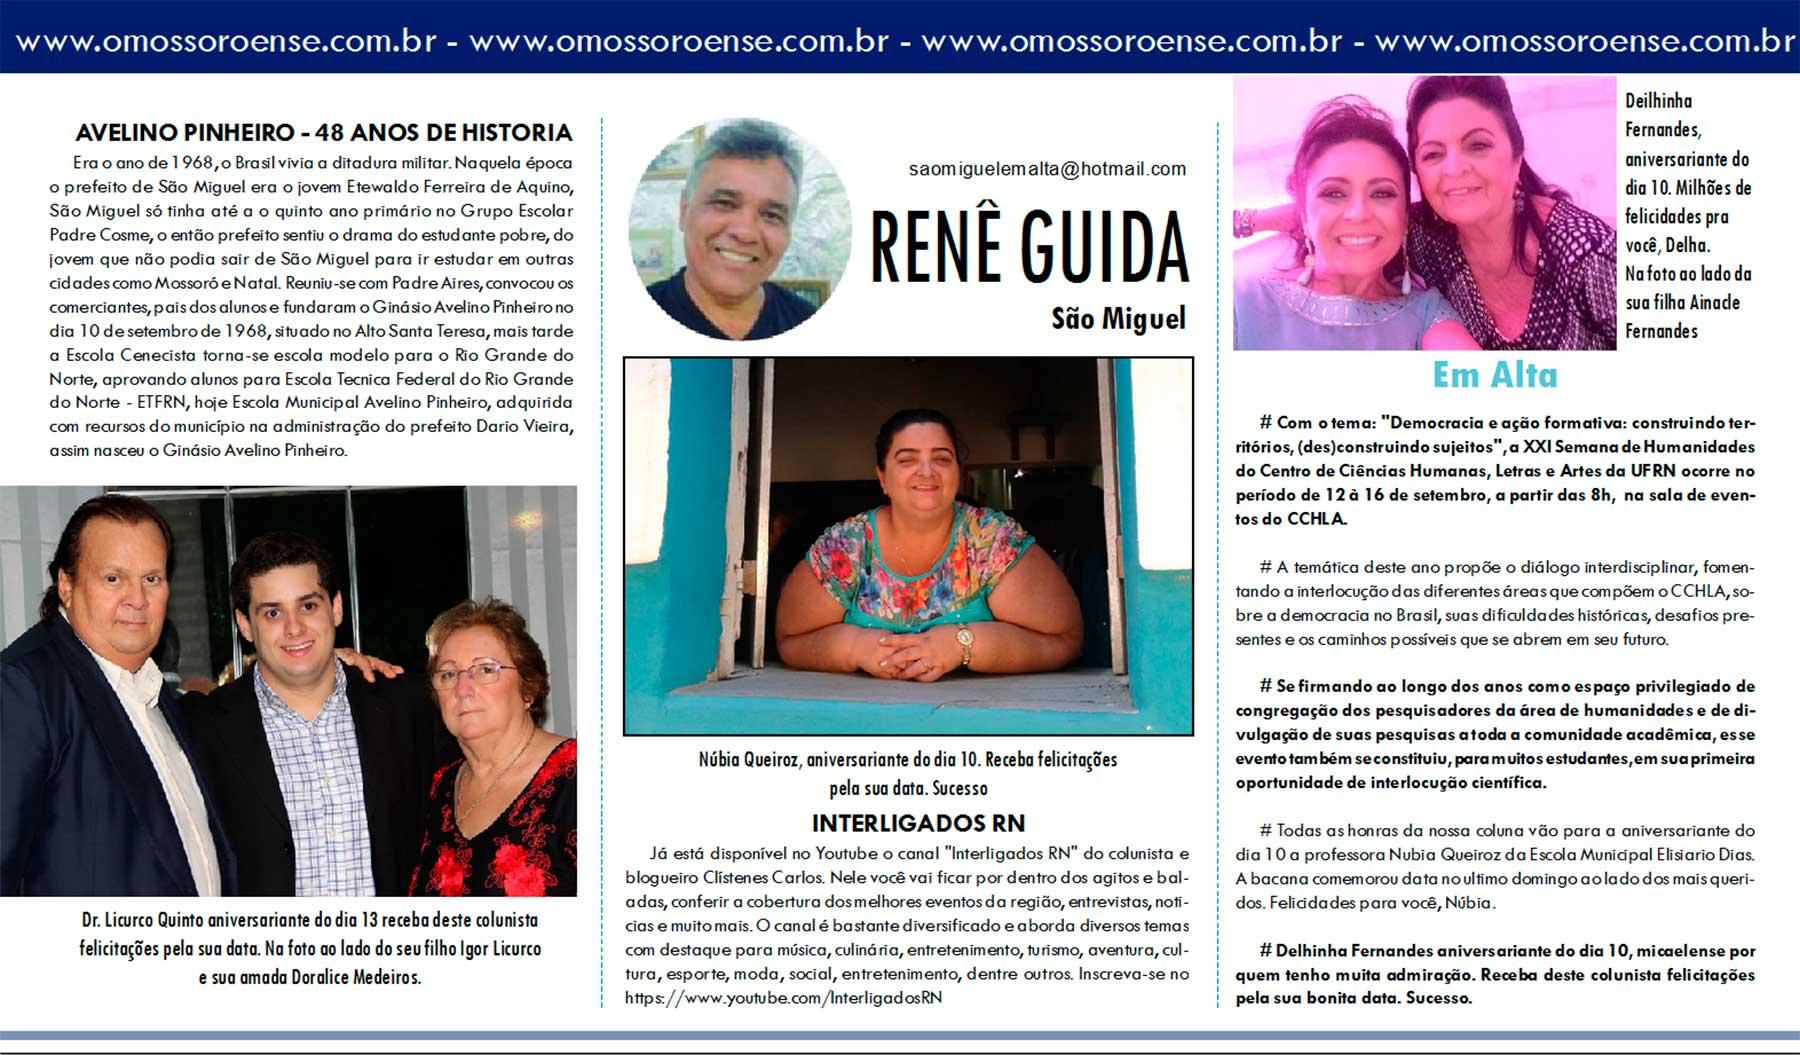 rene-guida-19-09-2016